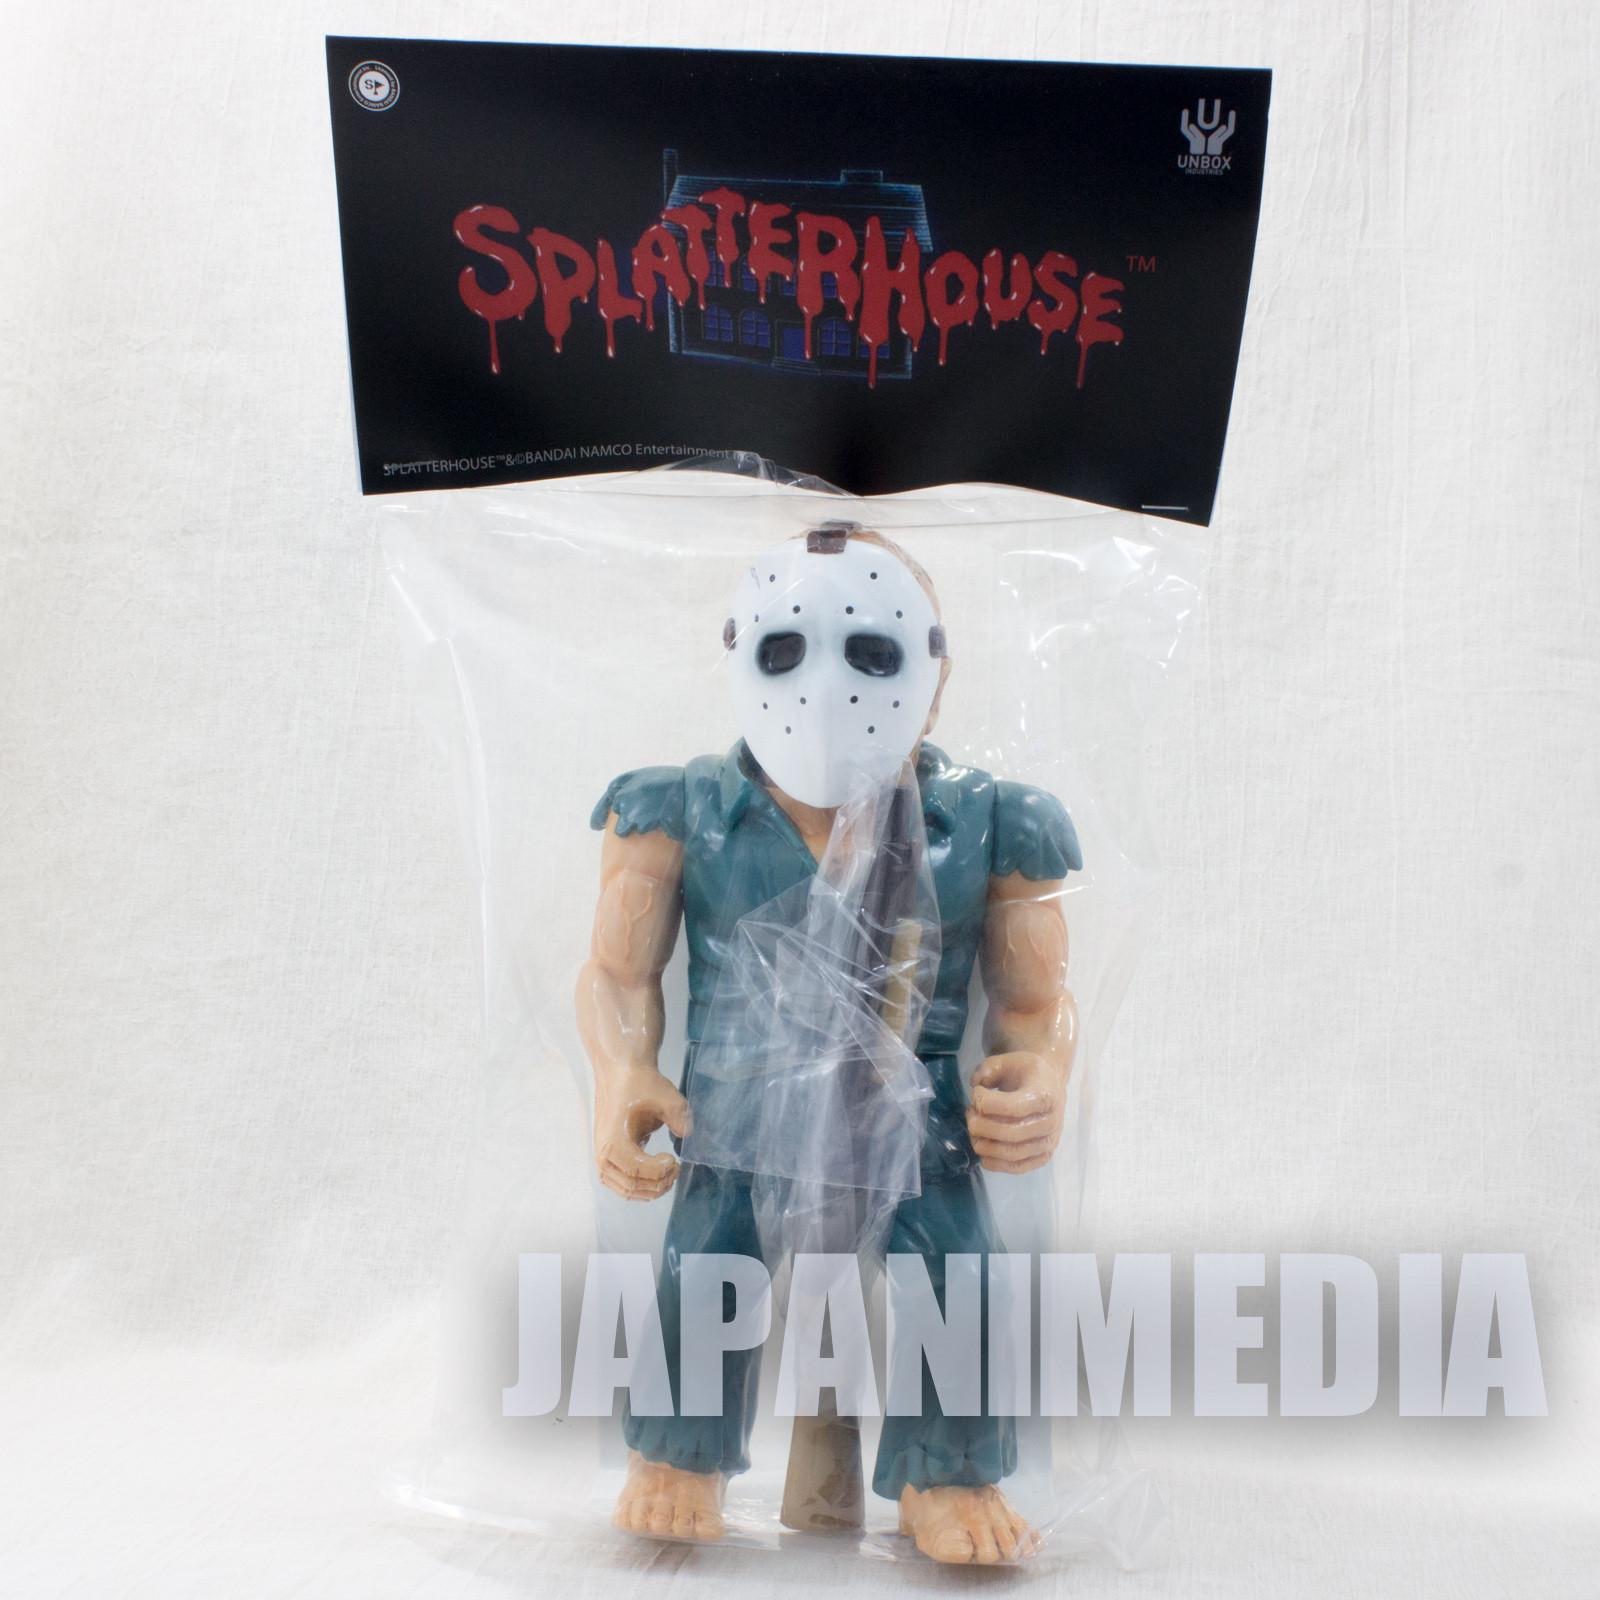 "Splatter House Rick Taylor with Shotgun Soft Vinyl Figure 10"" JAPAN"